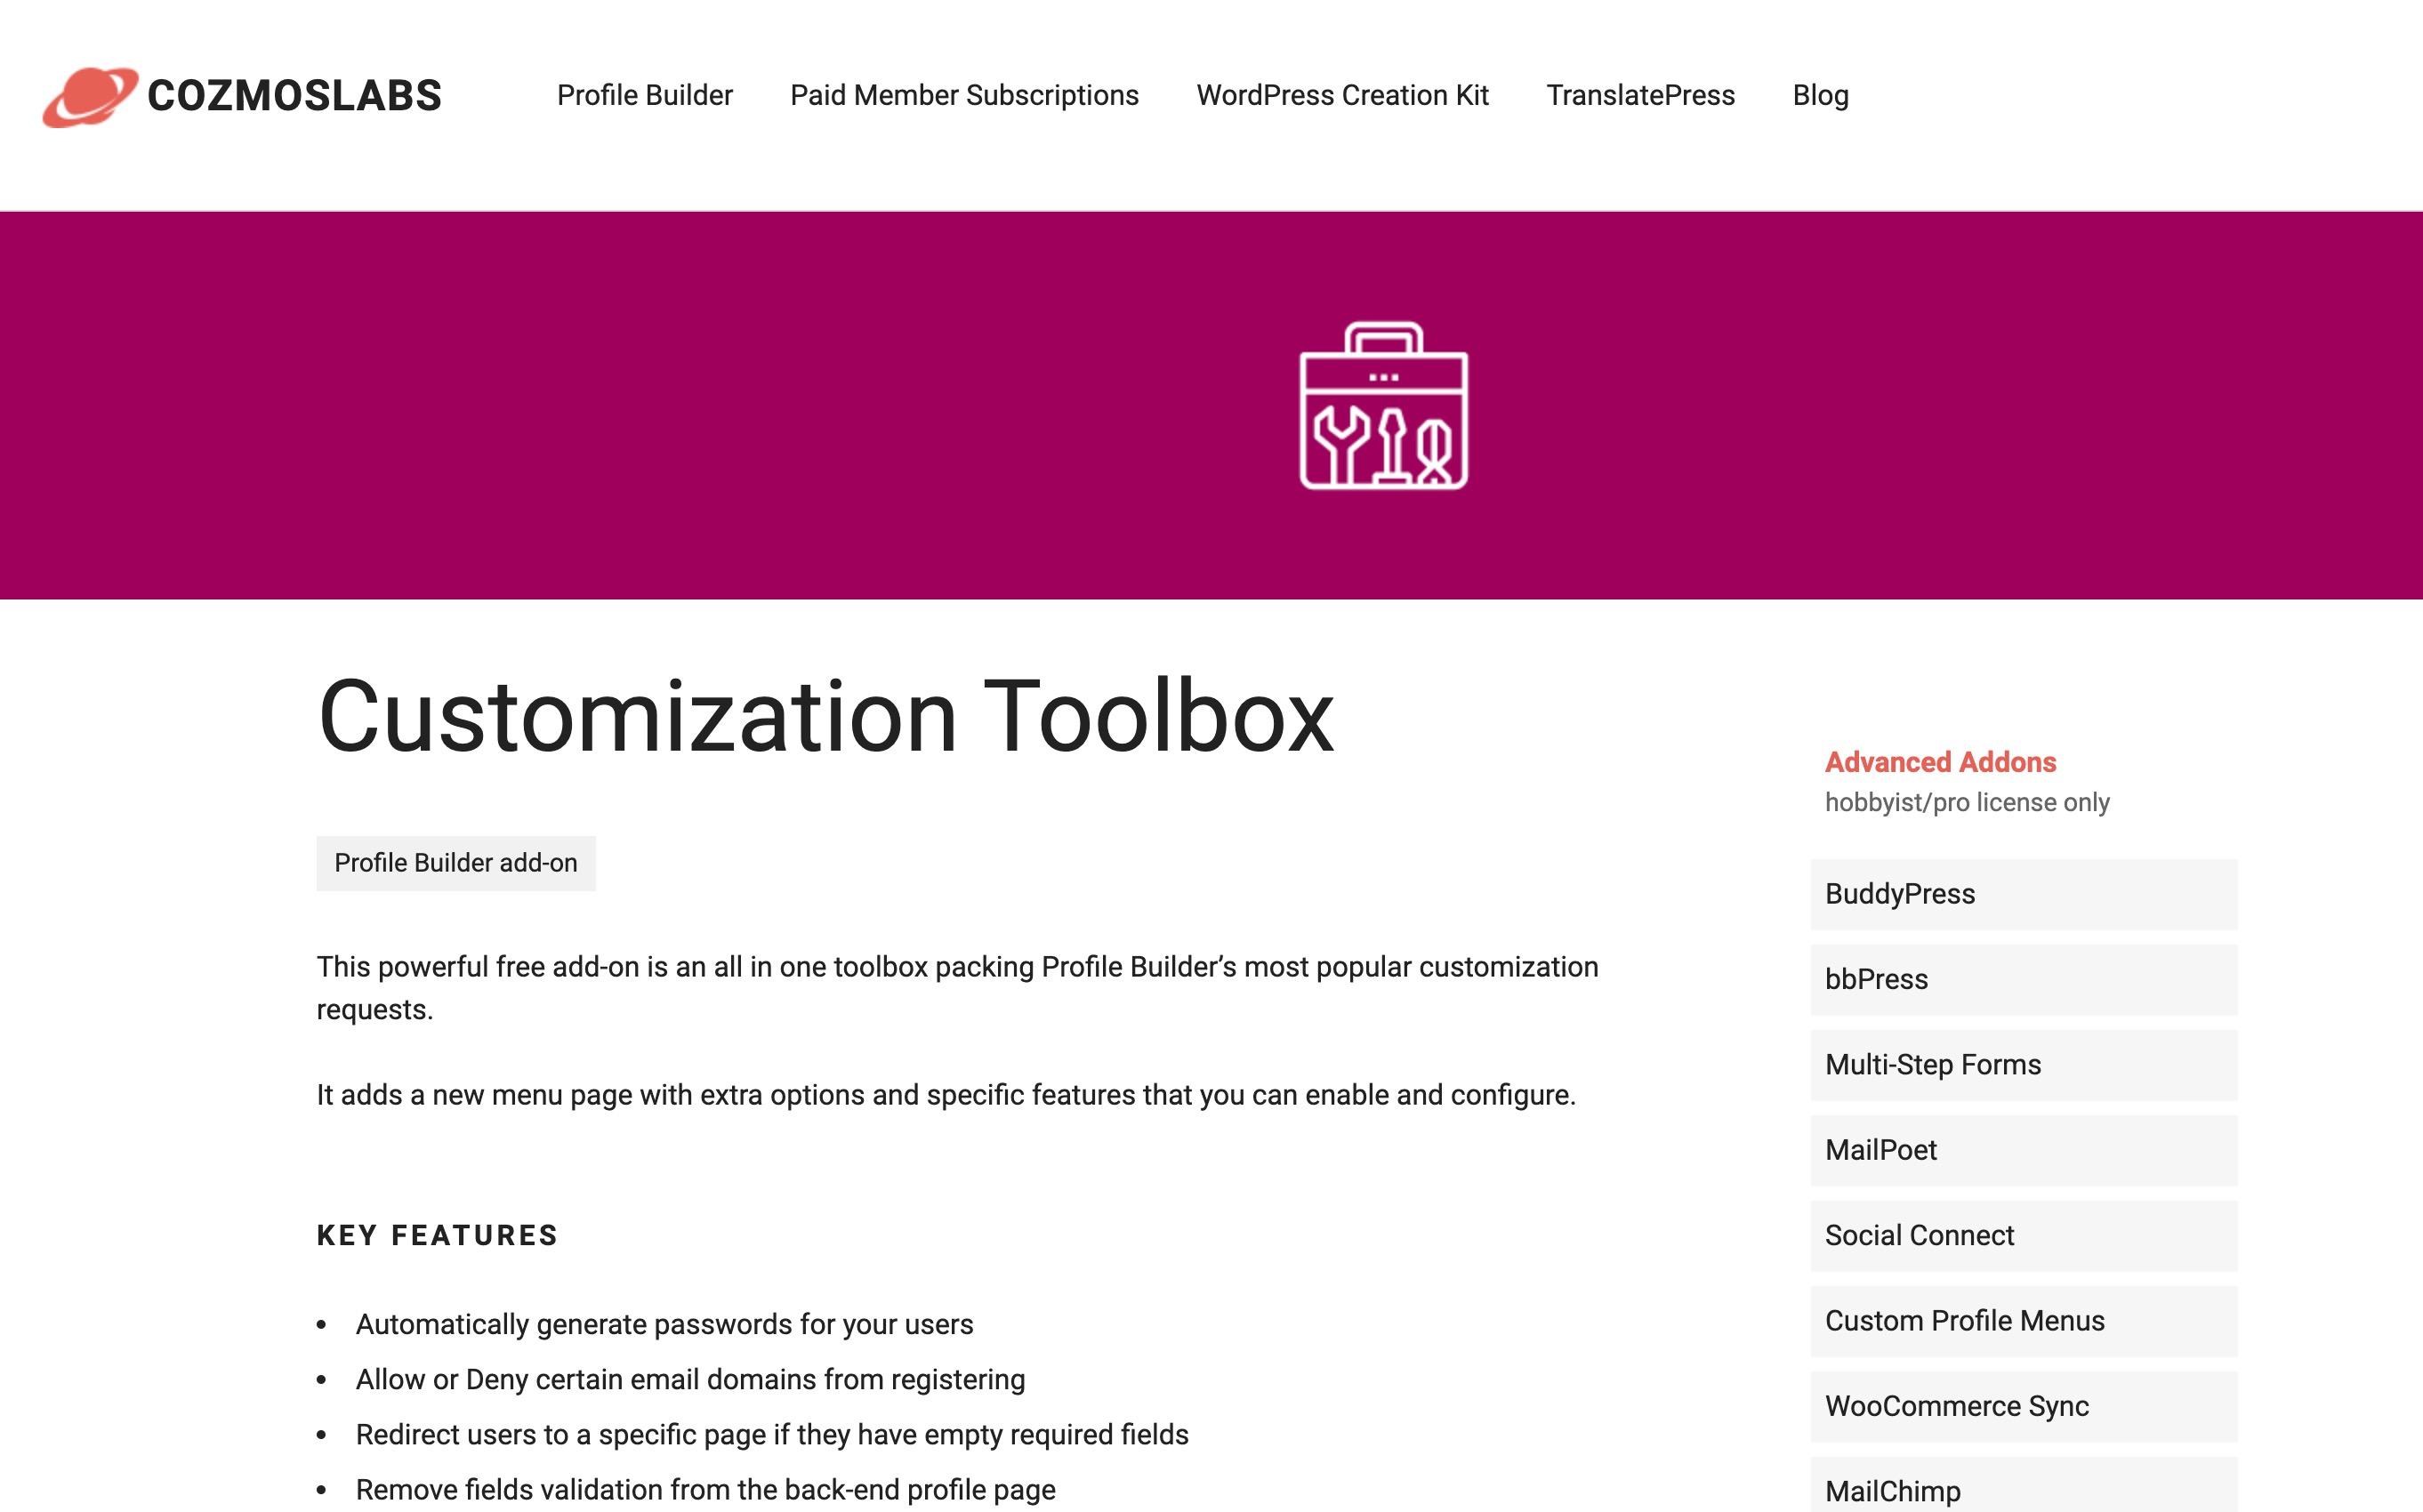 customization toolbox